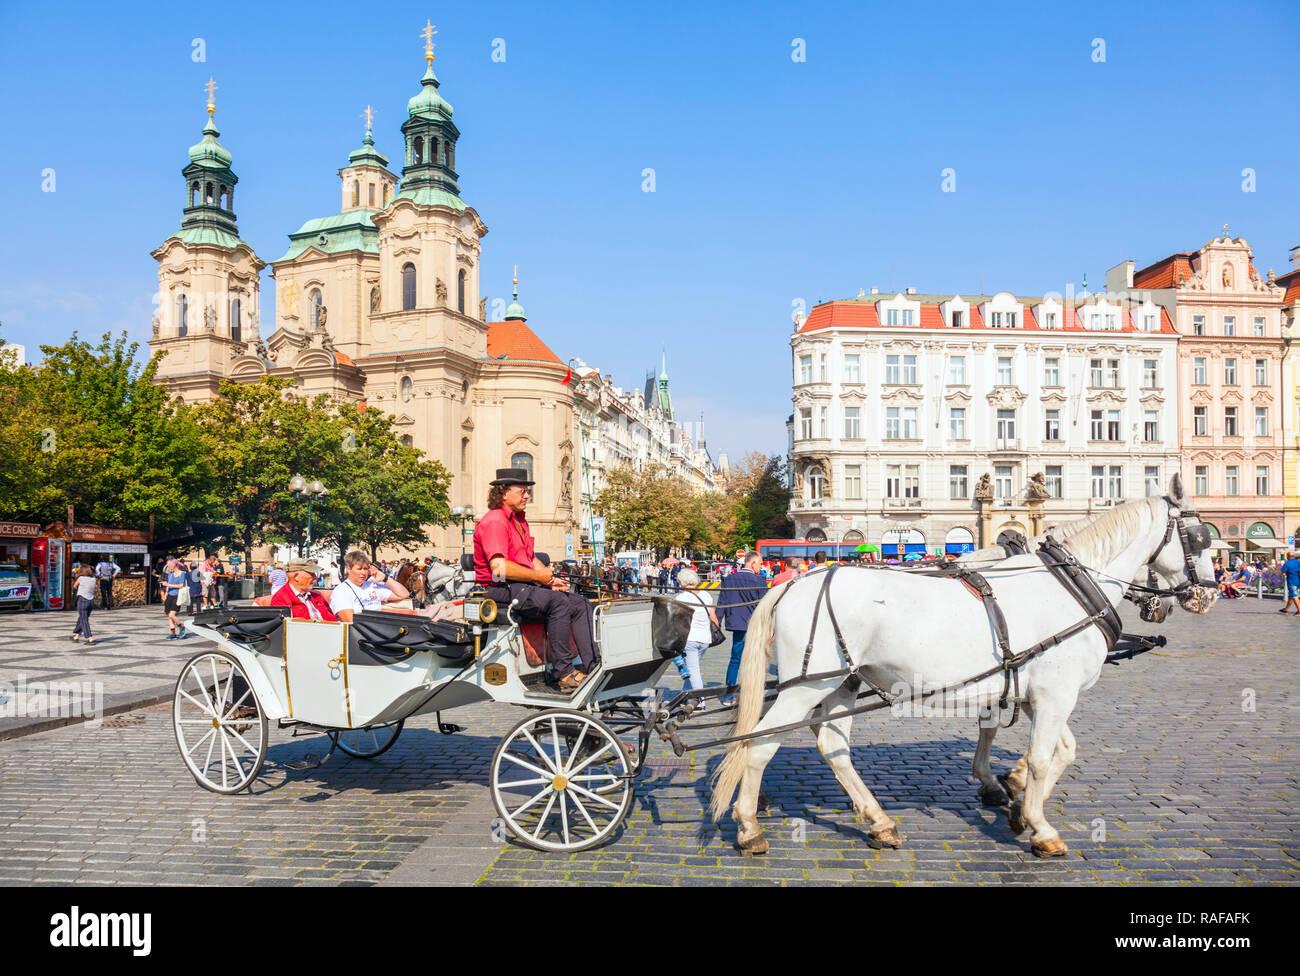 Prague St Nicholas church Prague horse and carriage rides from the Old town square Staroměstské náměstí Prague Czech Republic Europe - Stock Image